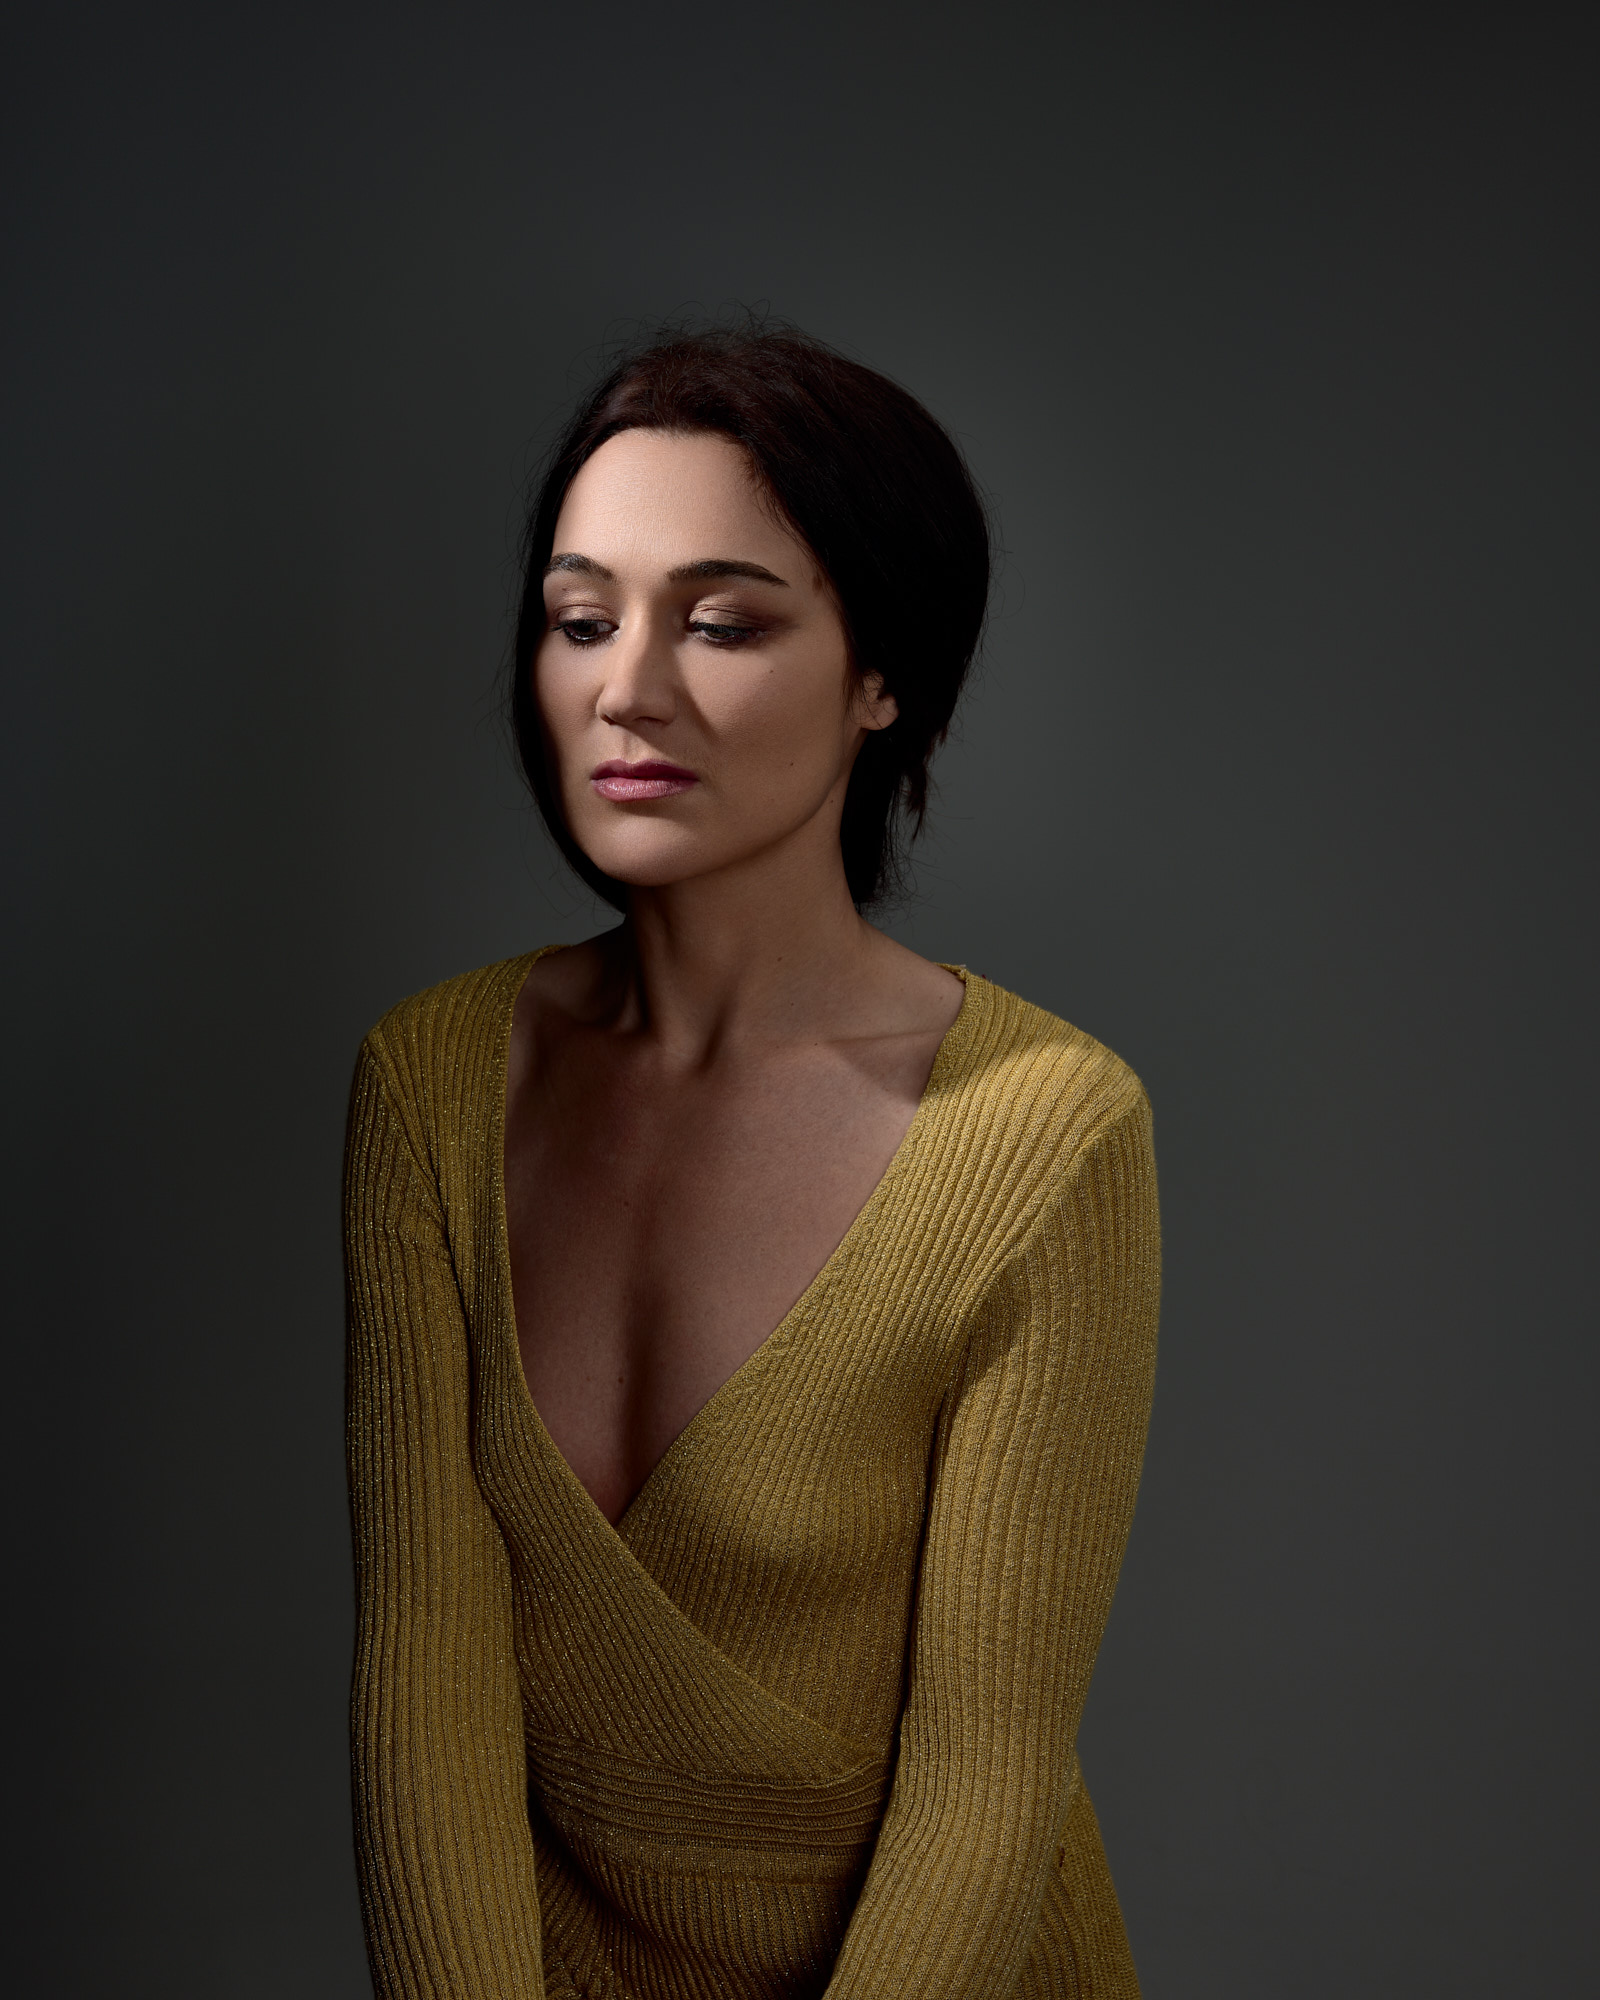 Céline Ricaud / Série Portraits -